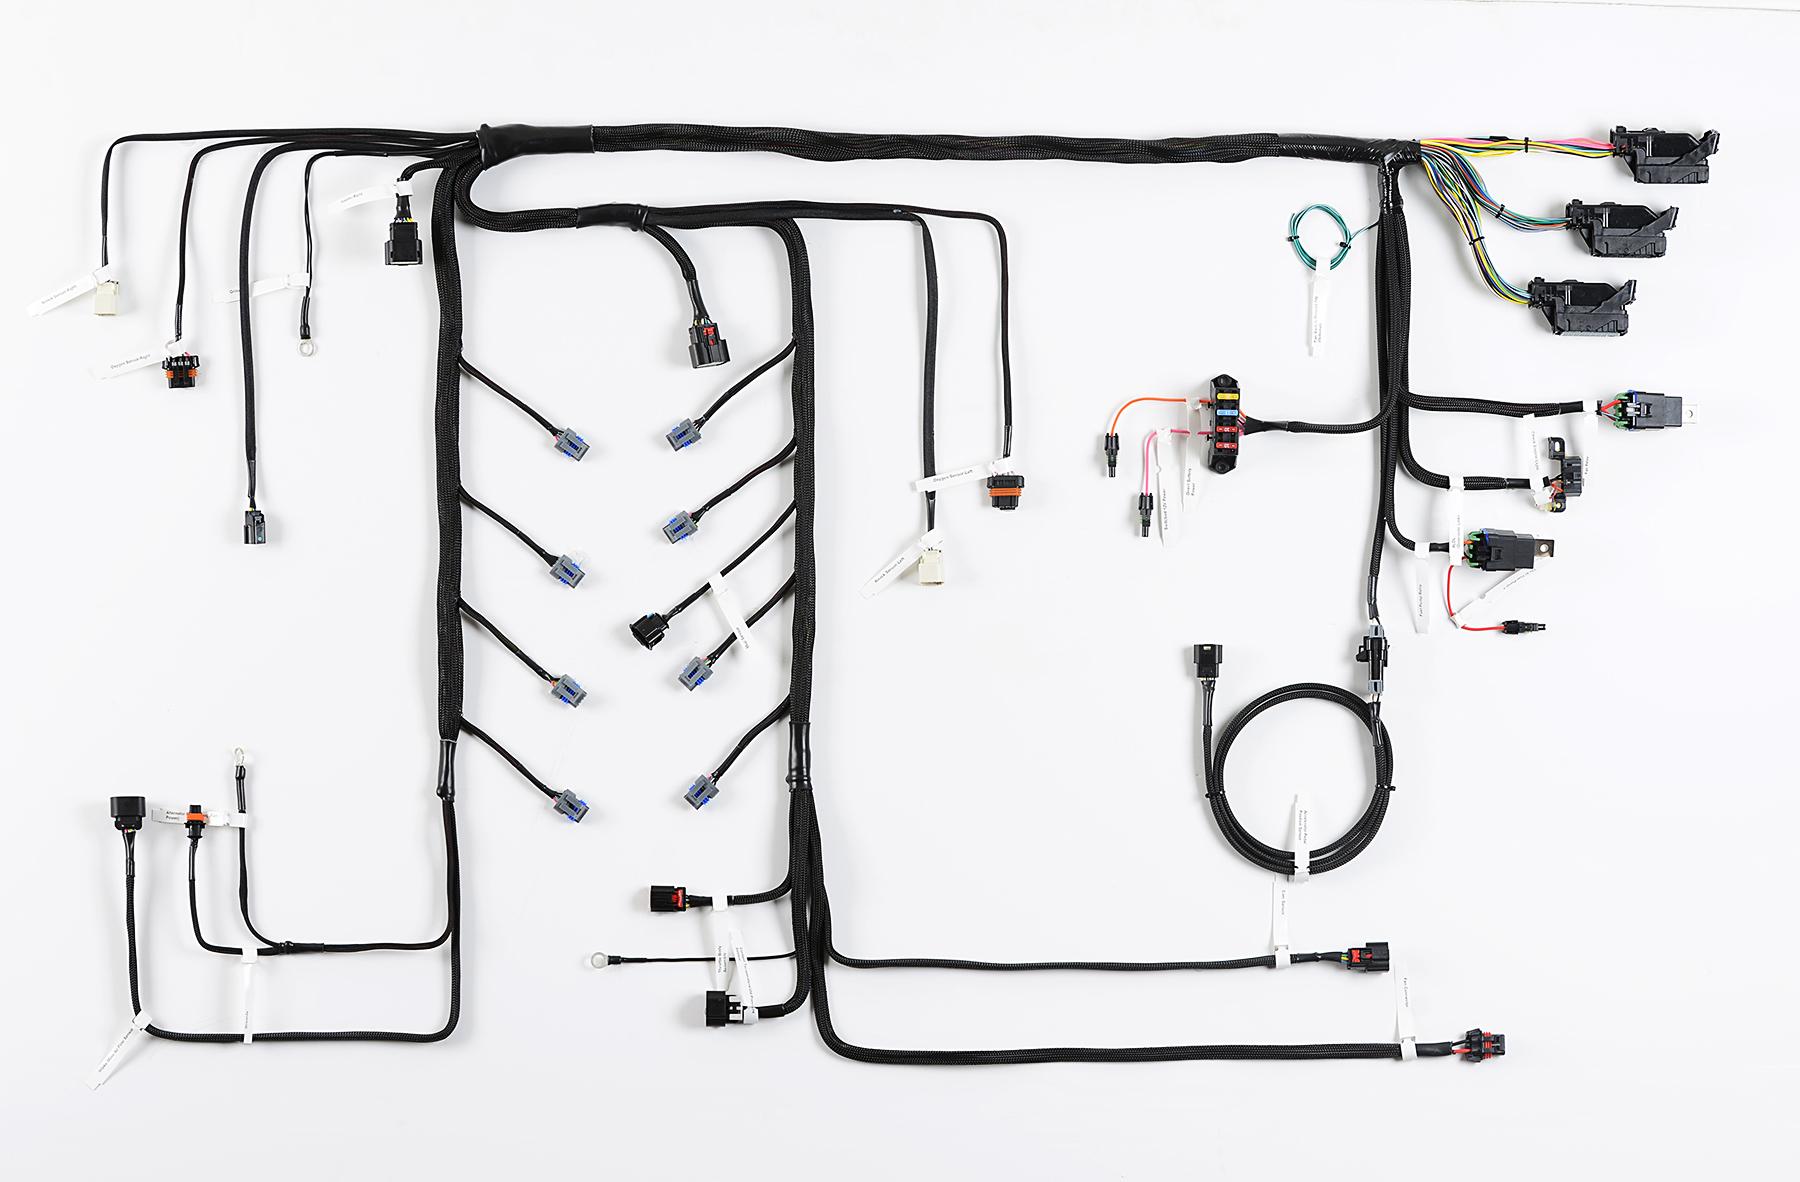 EcoTec Wiring Harness